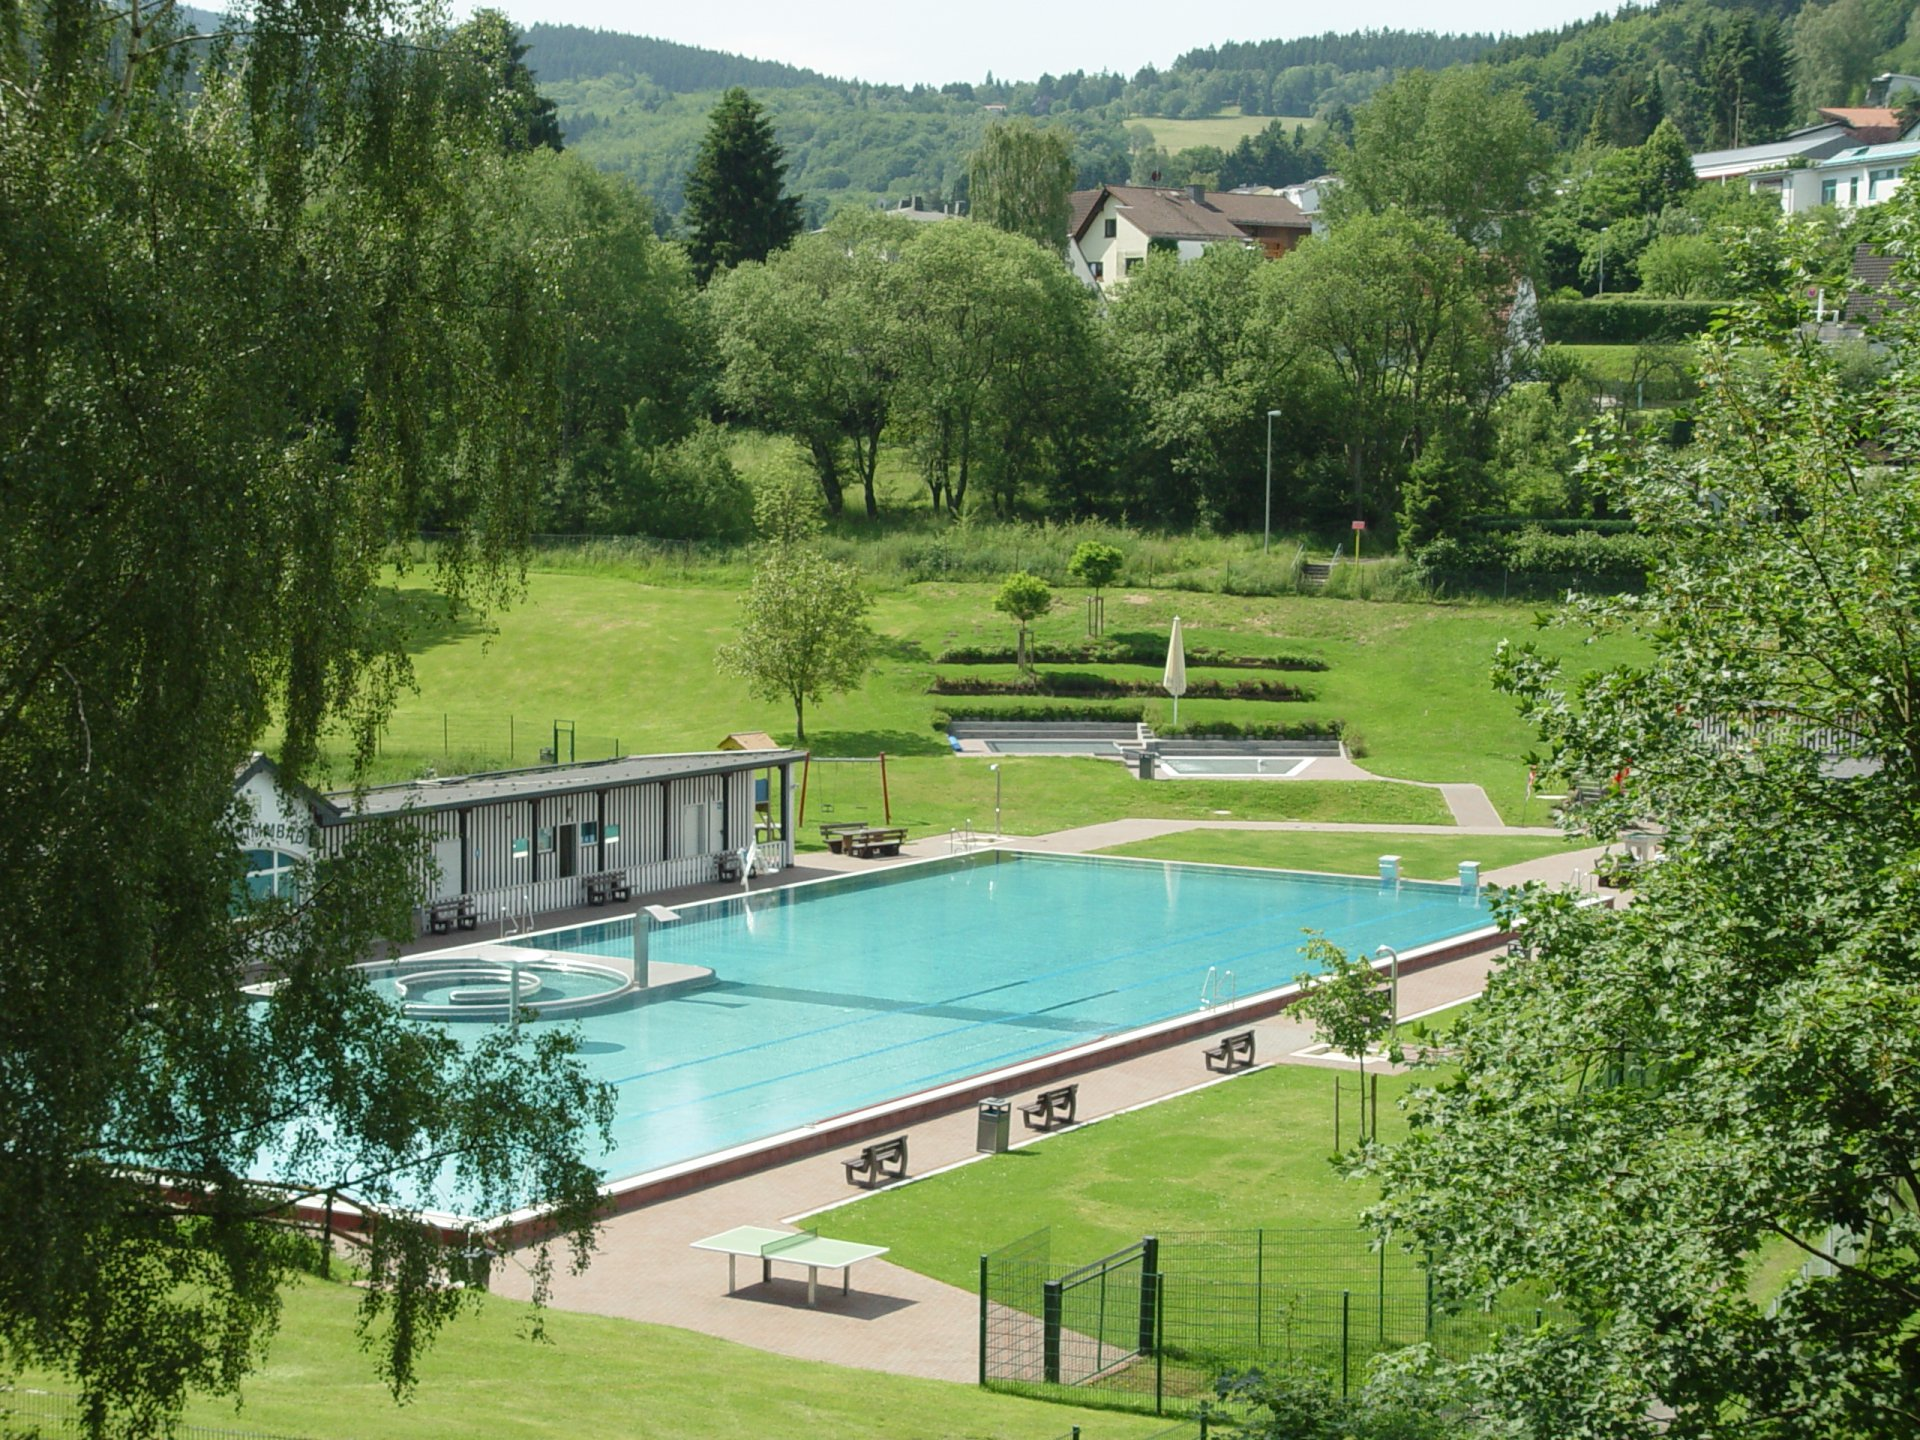 Freibad Hessen